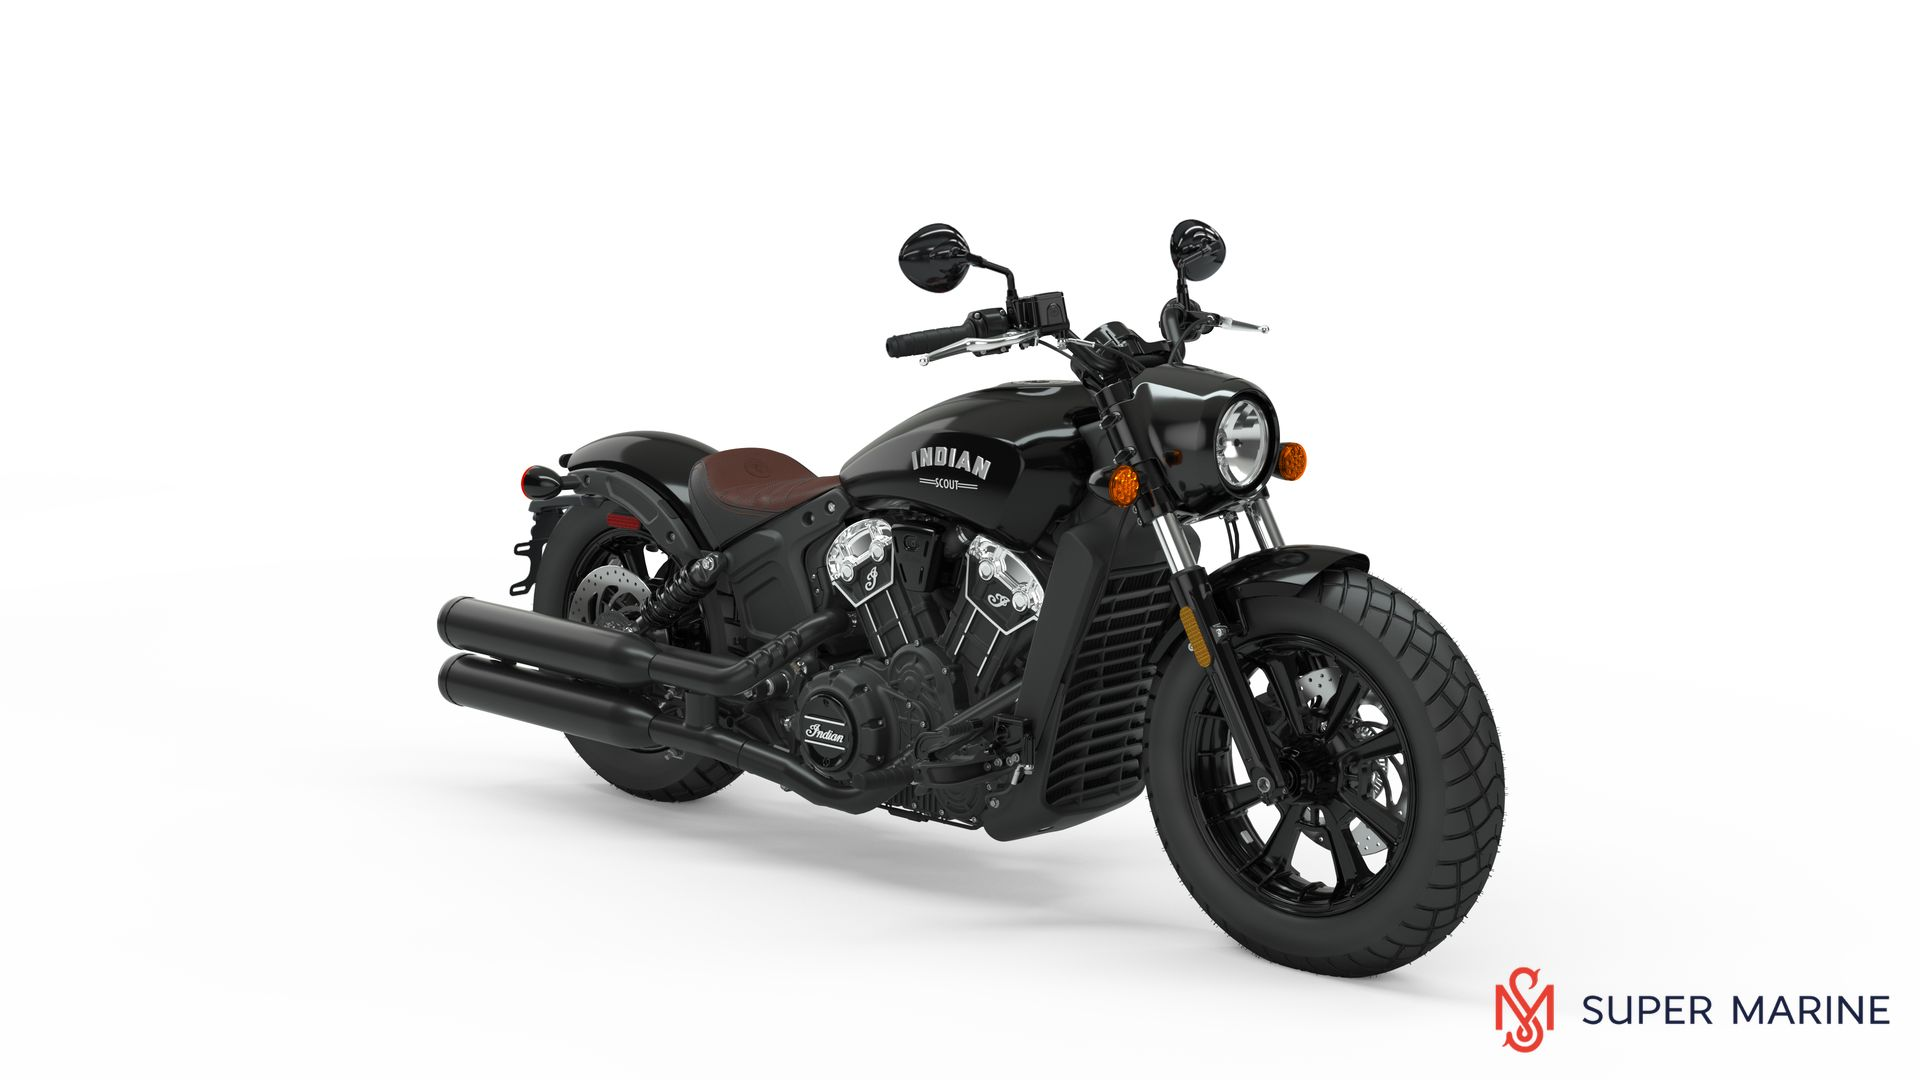 Мотоцикл Indian Scout Bobber Thunder Black 2020 - 1